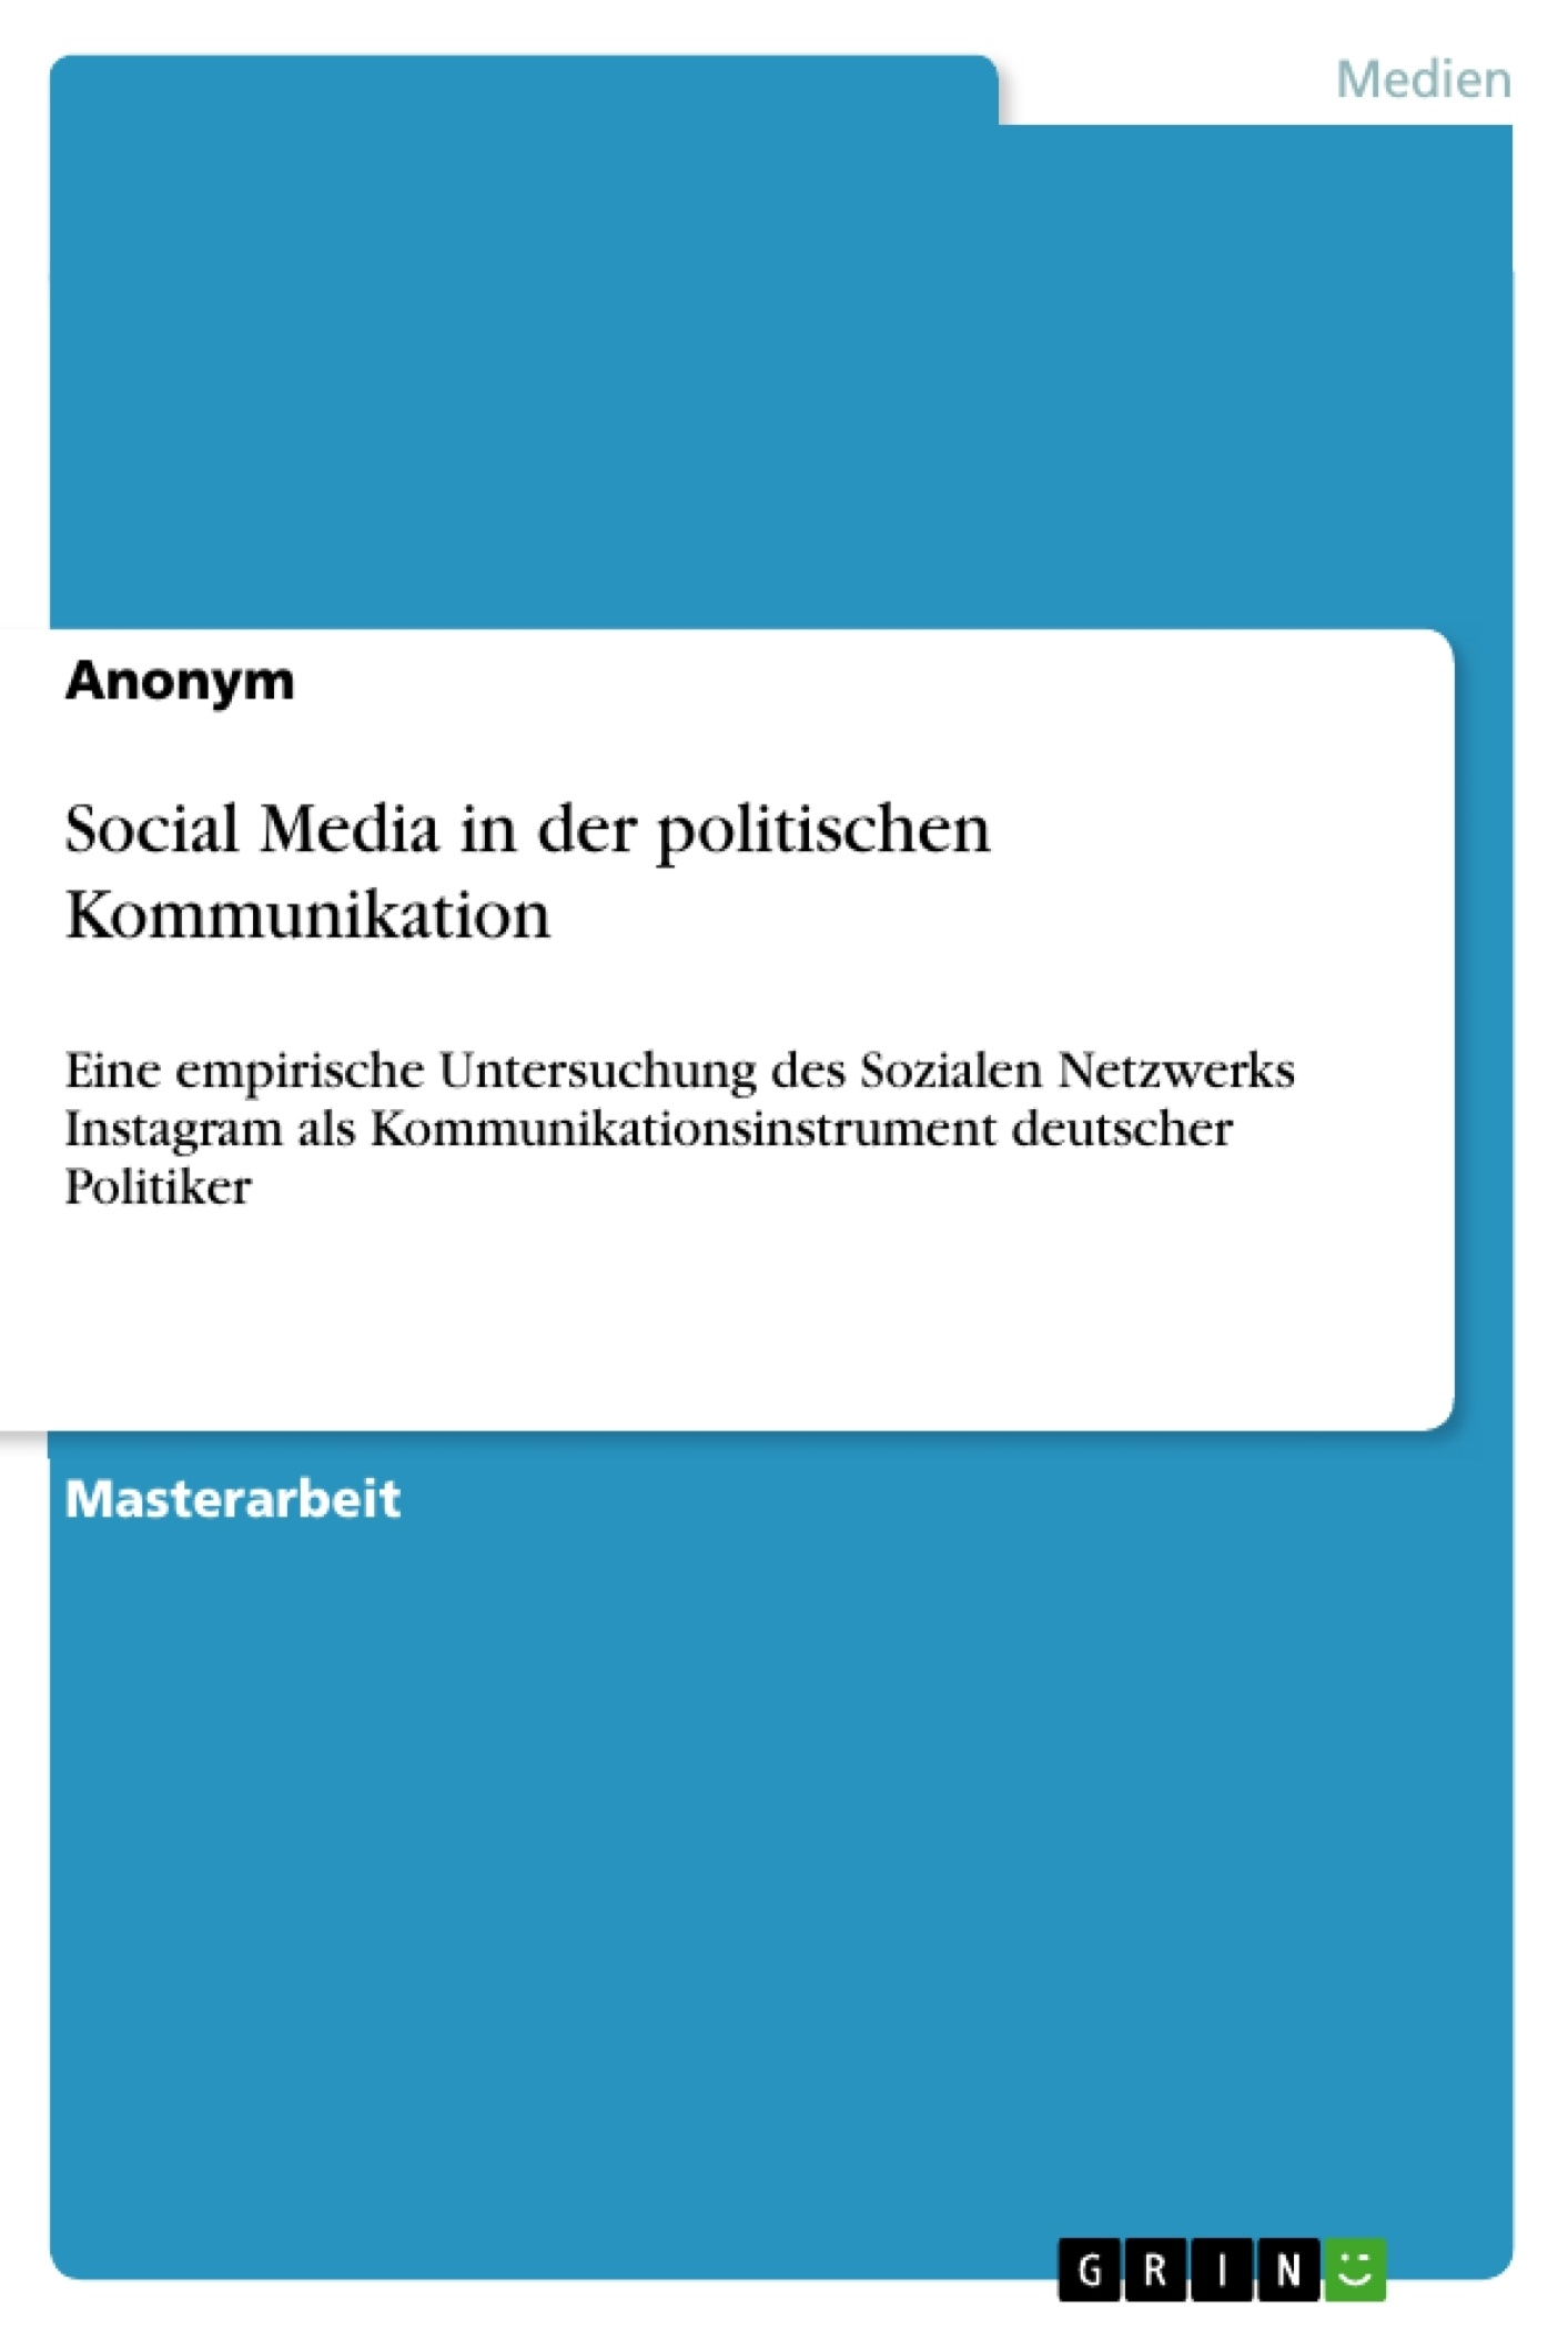 Titel: Social Media in der politischen Kommunikation